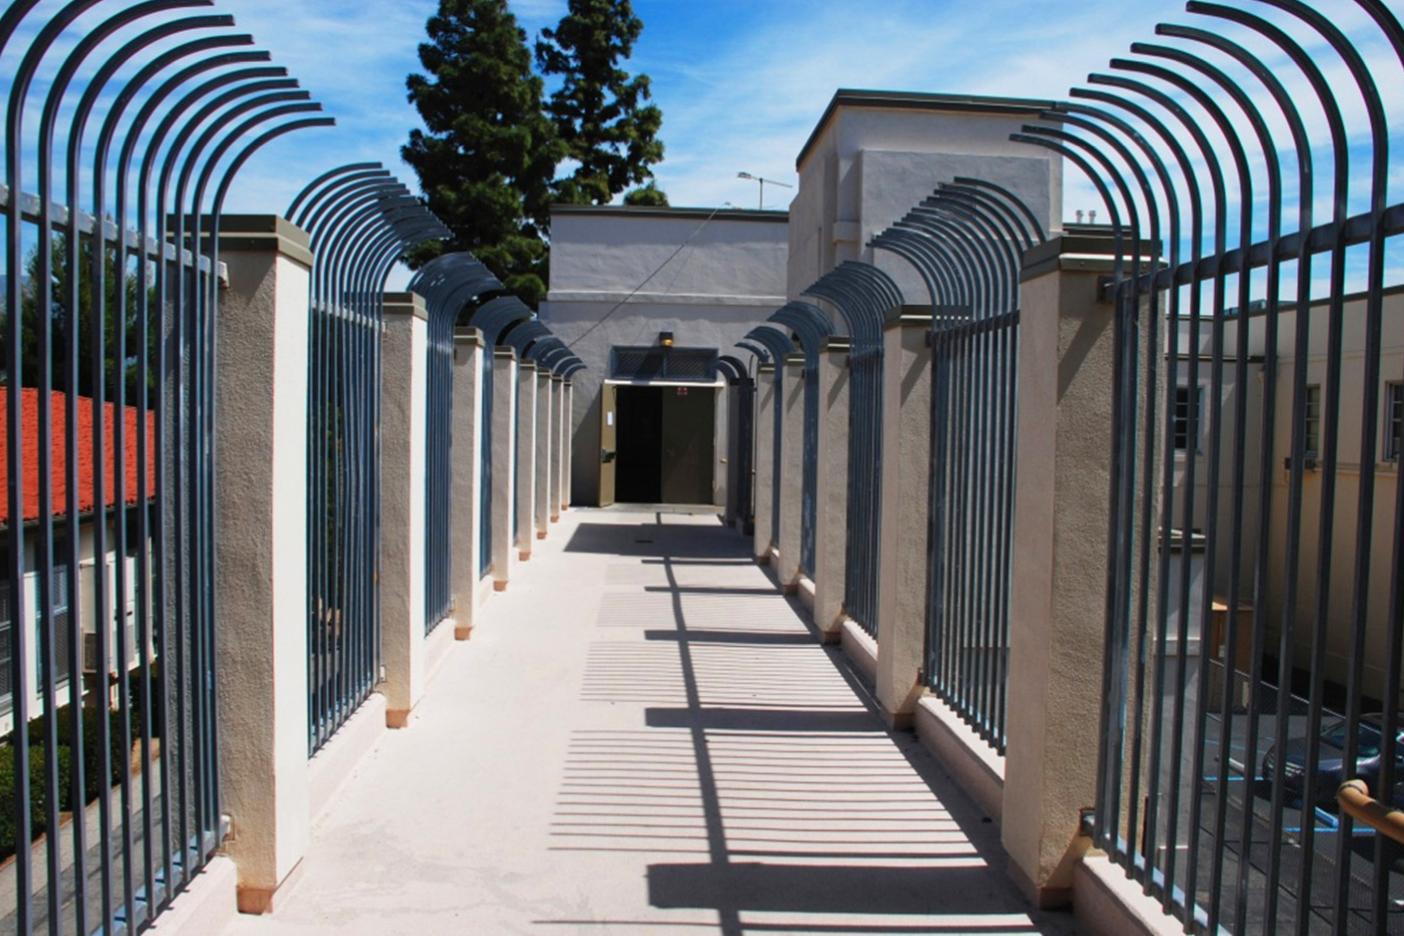 New bridge and elevator for San Fernando Elementary School 2